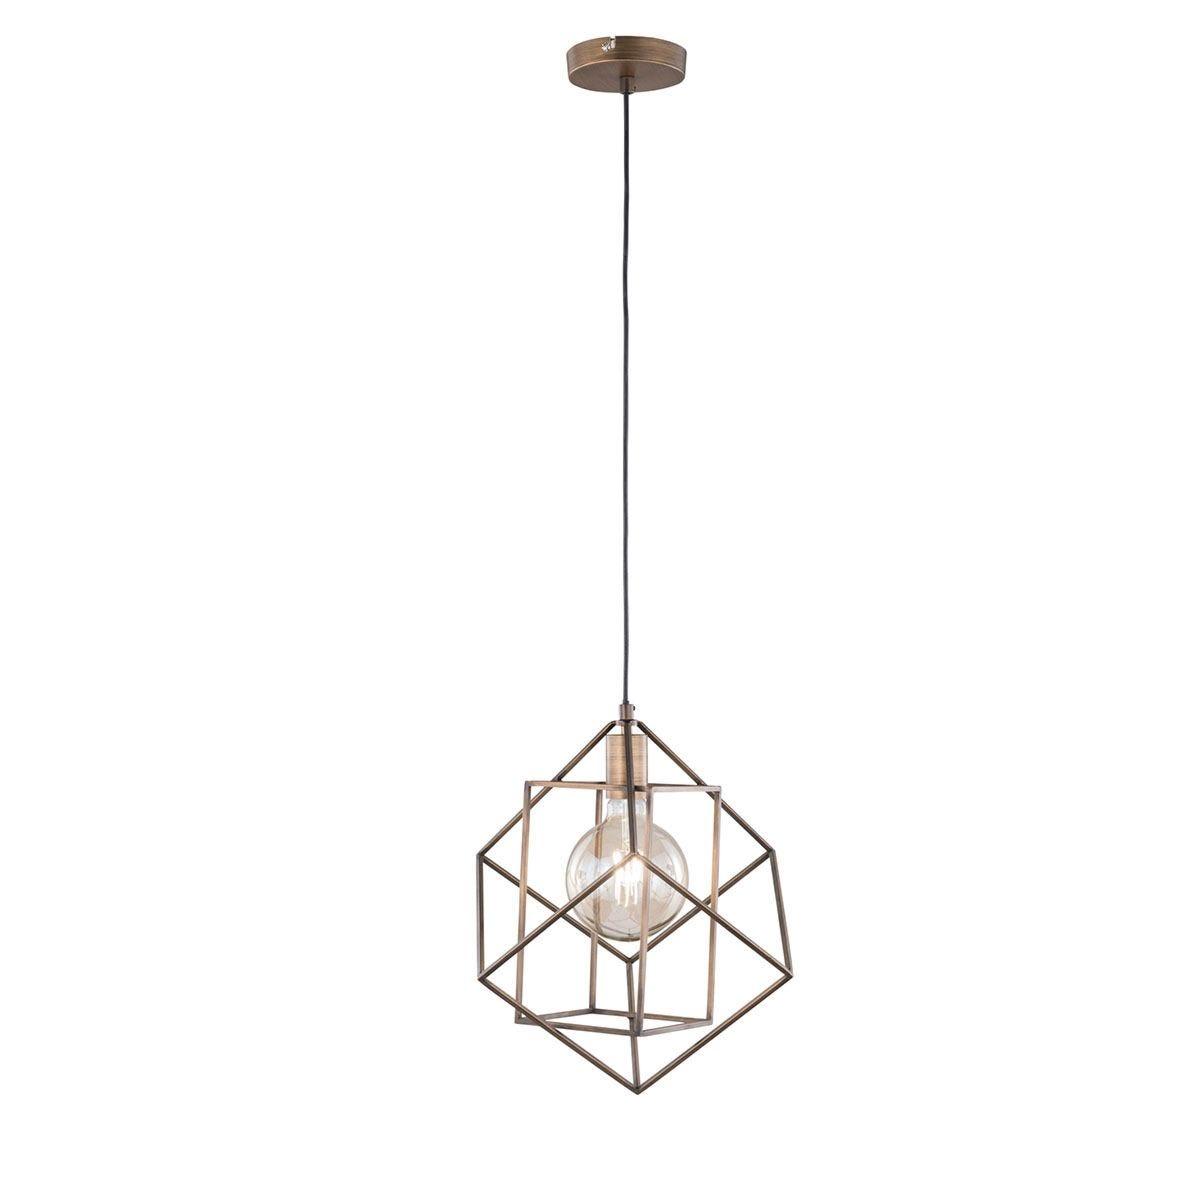 Wofi Girona Pendant Ceiling Light - Golden